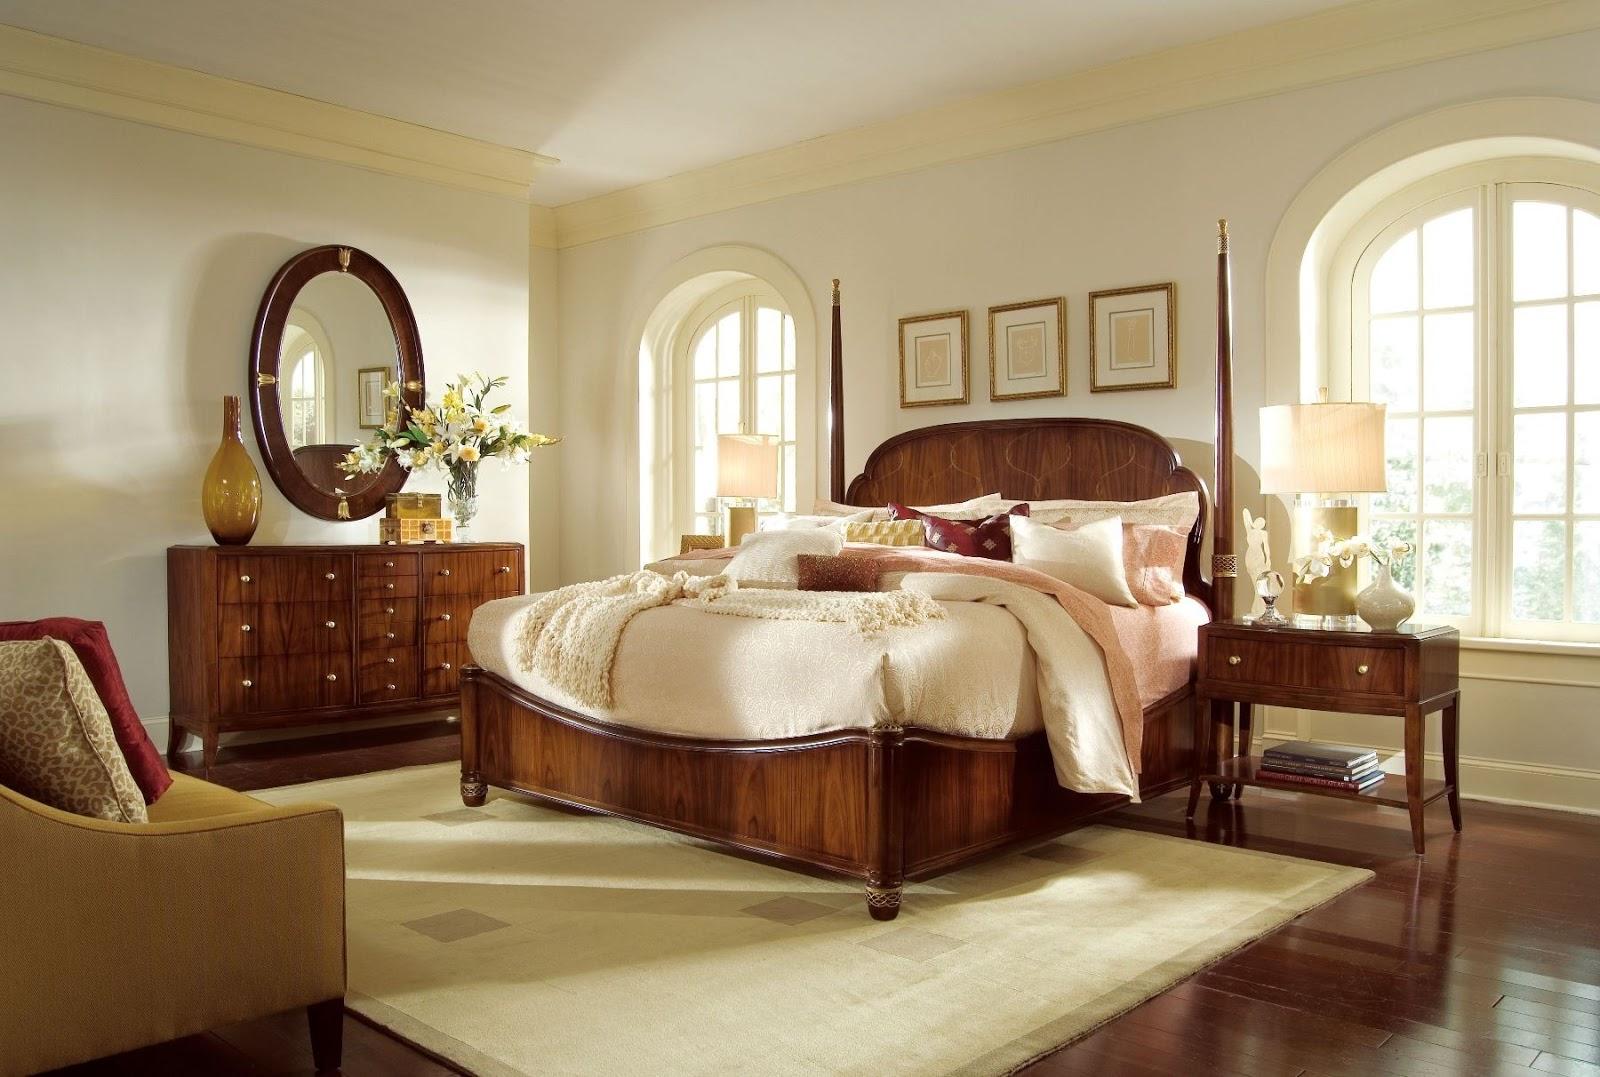 Modern Home Interiors Houzz Furniture Inspiring Interior Tuscan Houzz  bedroom design  Houzz Bedroom Design YouTube. Houzz Bedroom Furniture Ideas